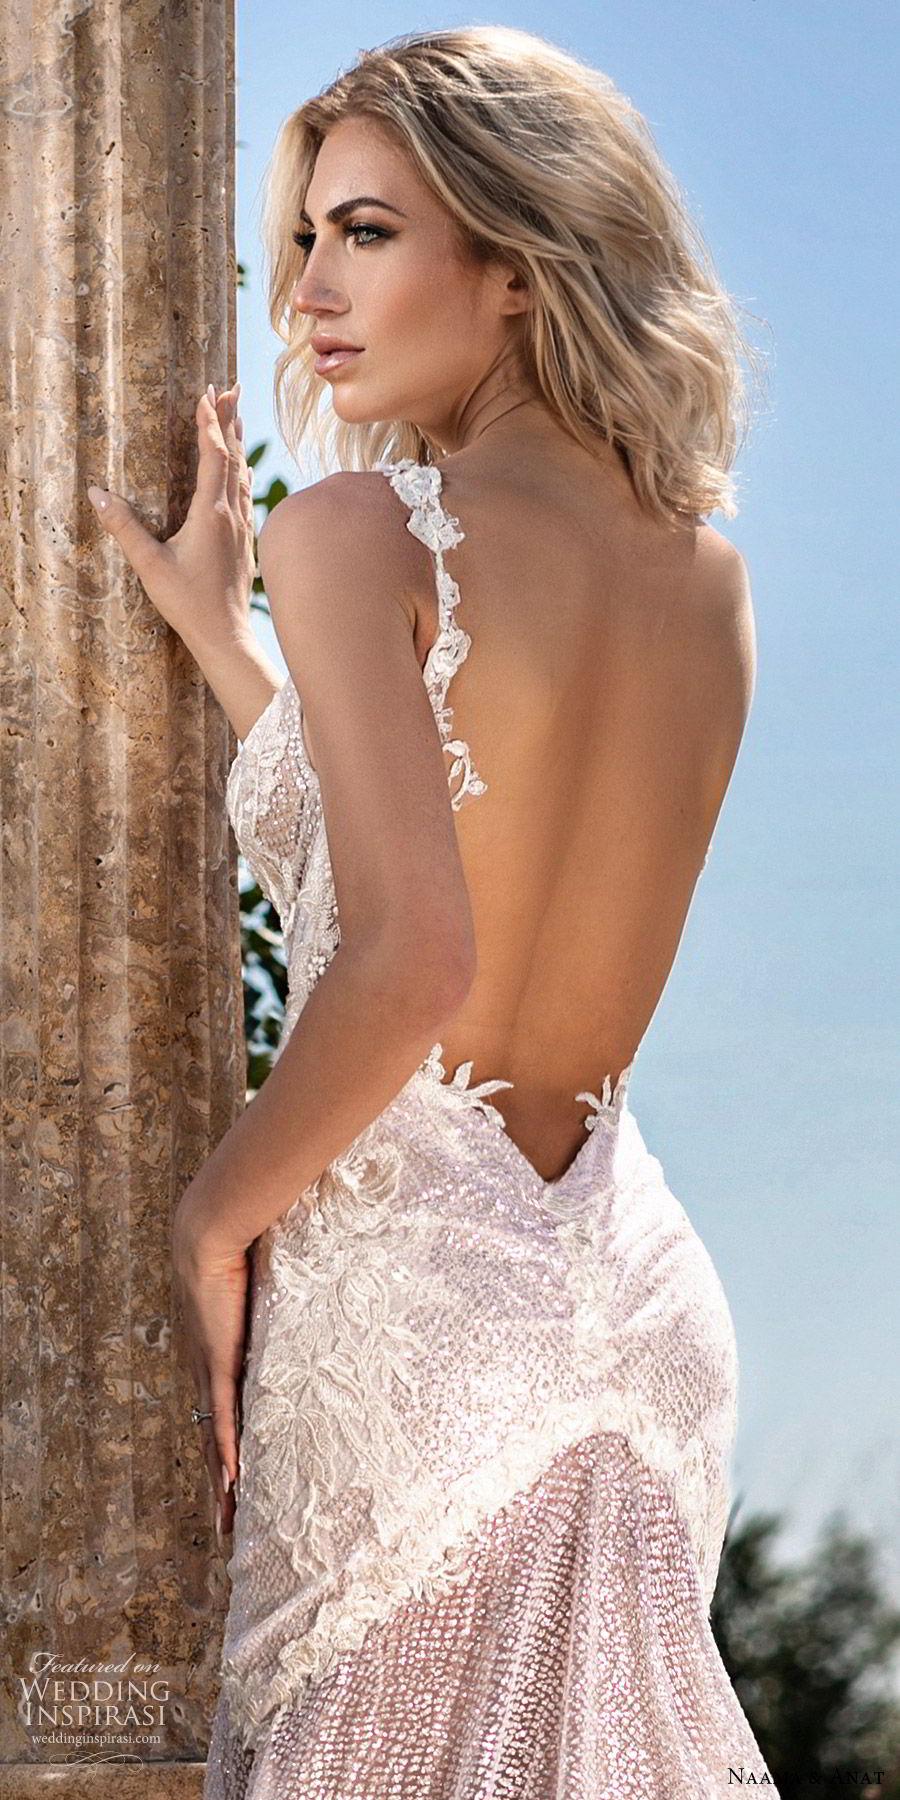 naama anat spring 2020 bridal sleeveless deep v neckline fit flare mermaid wedding dress (7) mv sheer low back chapel train sexy glamorours blush zbv